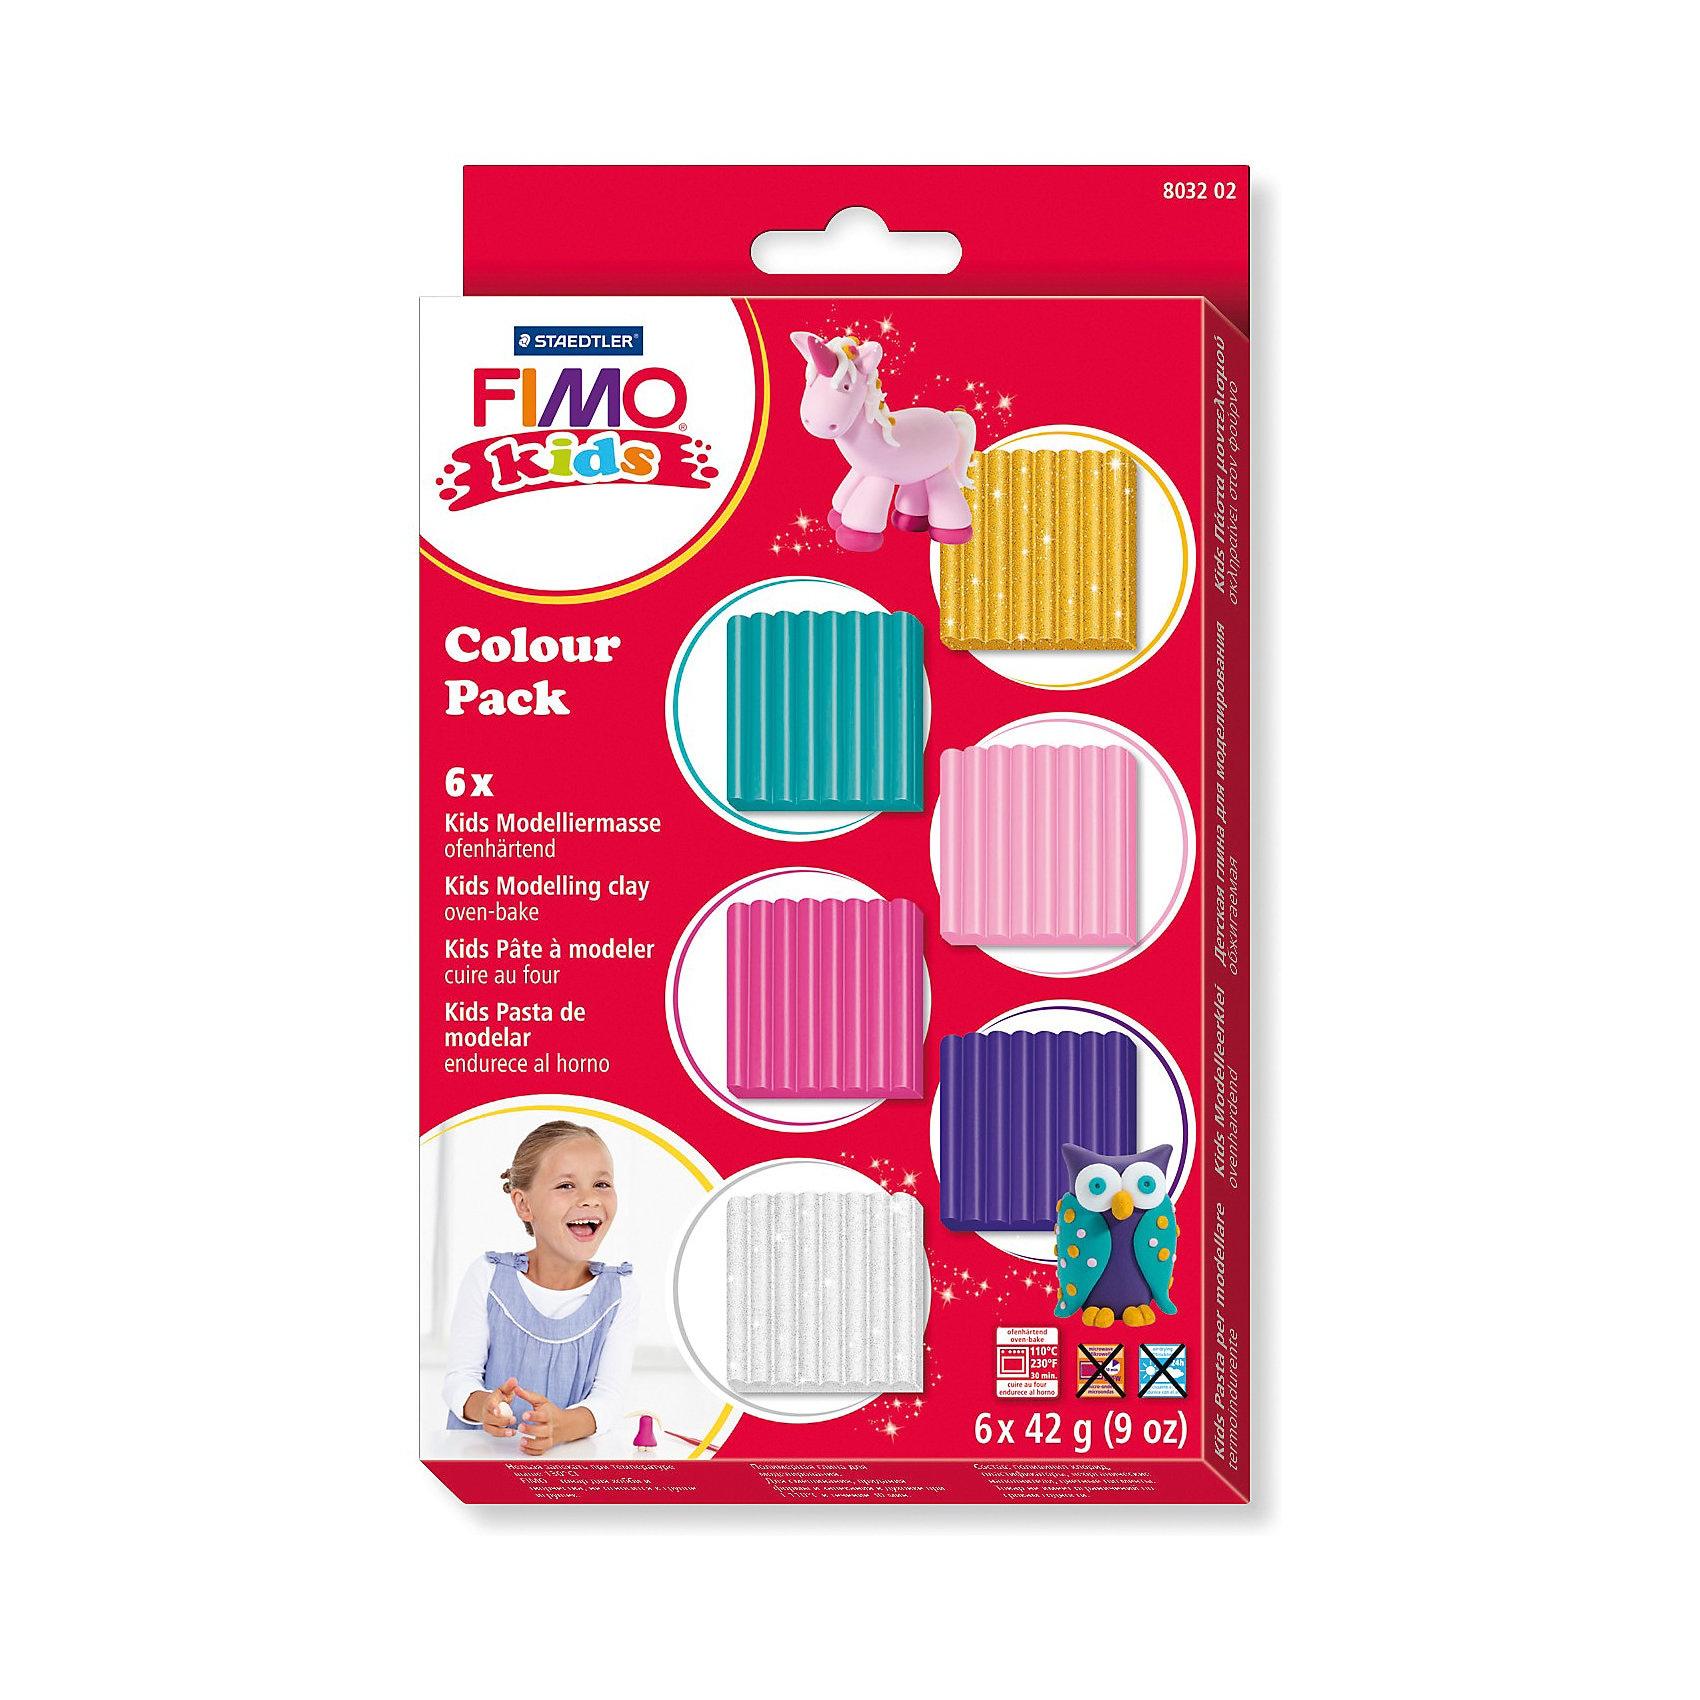 Staedtler Fimo kids Materialpackung girlie 6 x 42 g